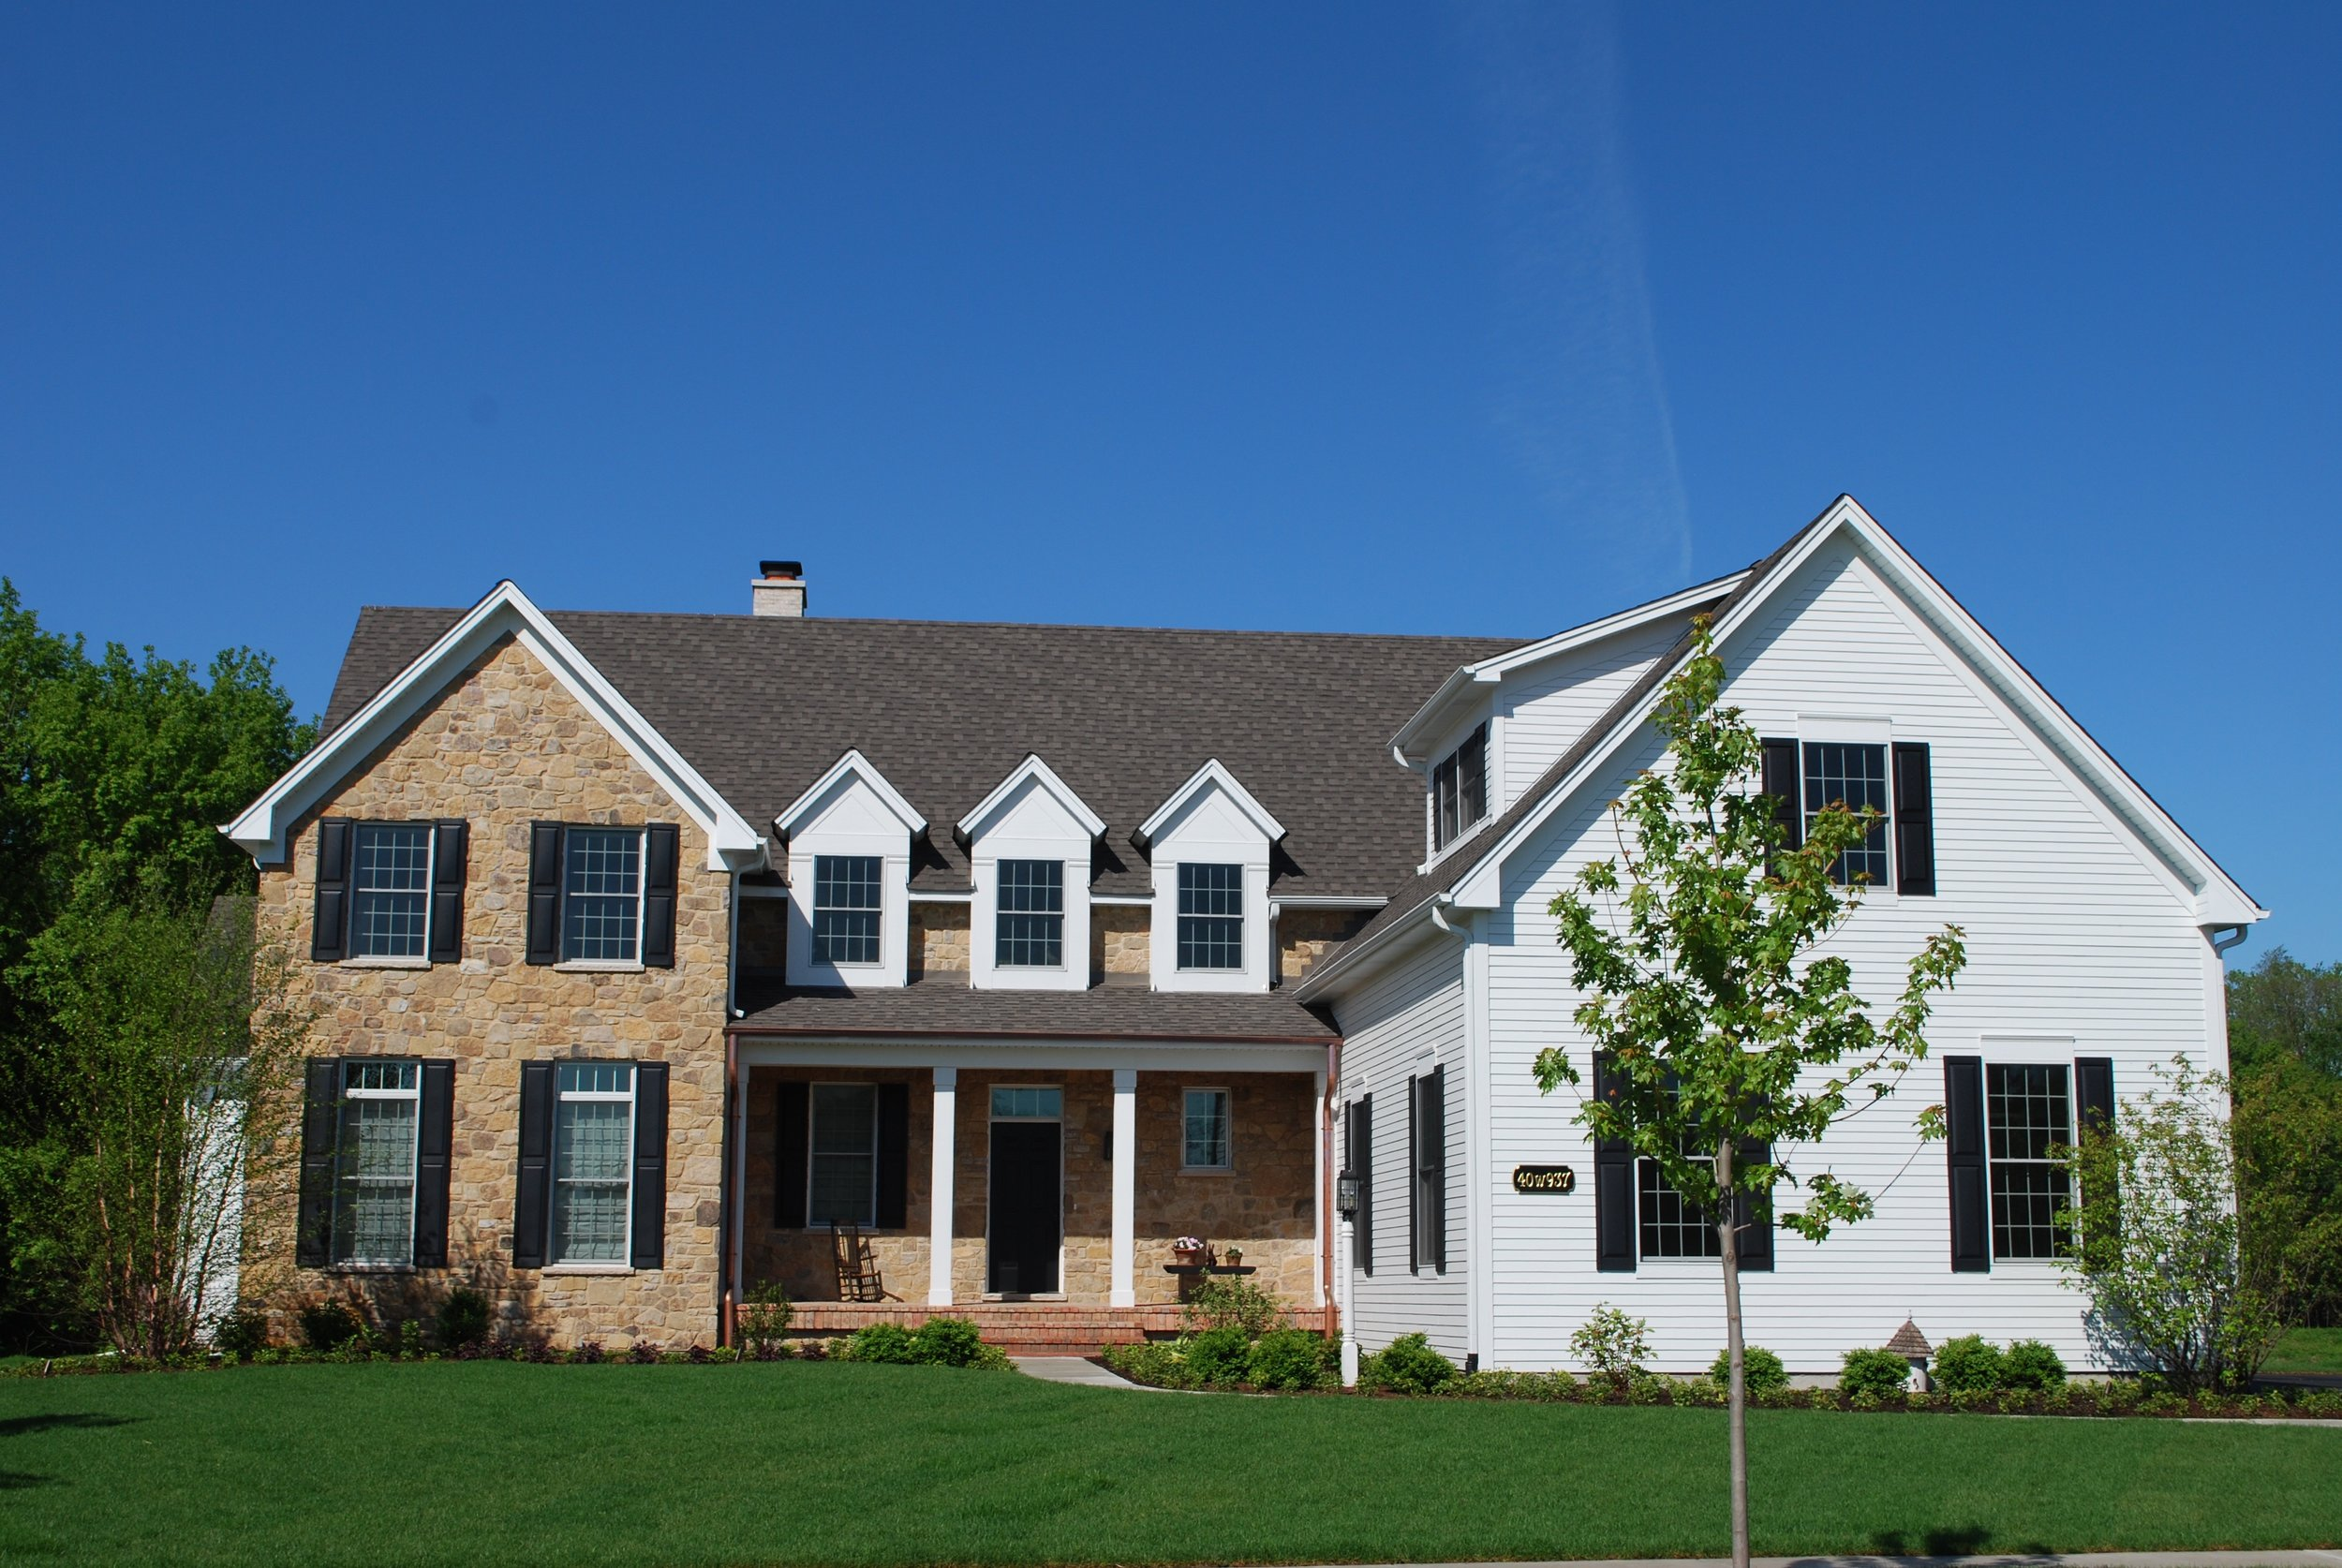 Custom Designed Home in Fox Creek to Replicate East Coast Farm House.  People think it is an Original Farmhouse!